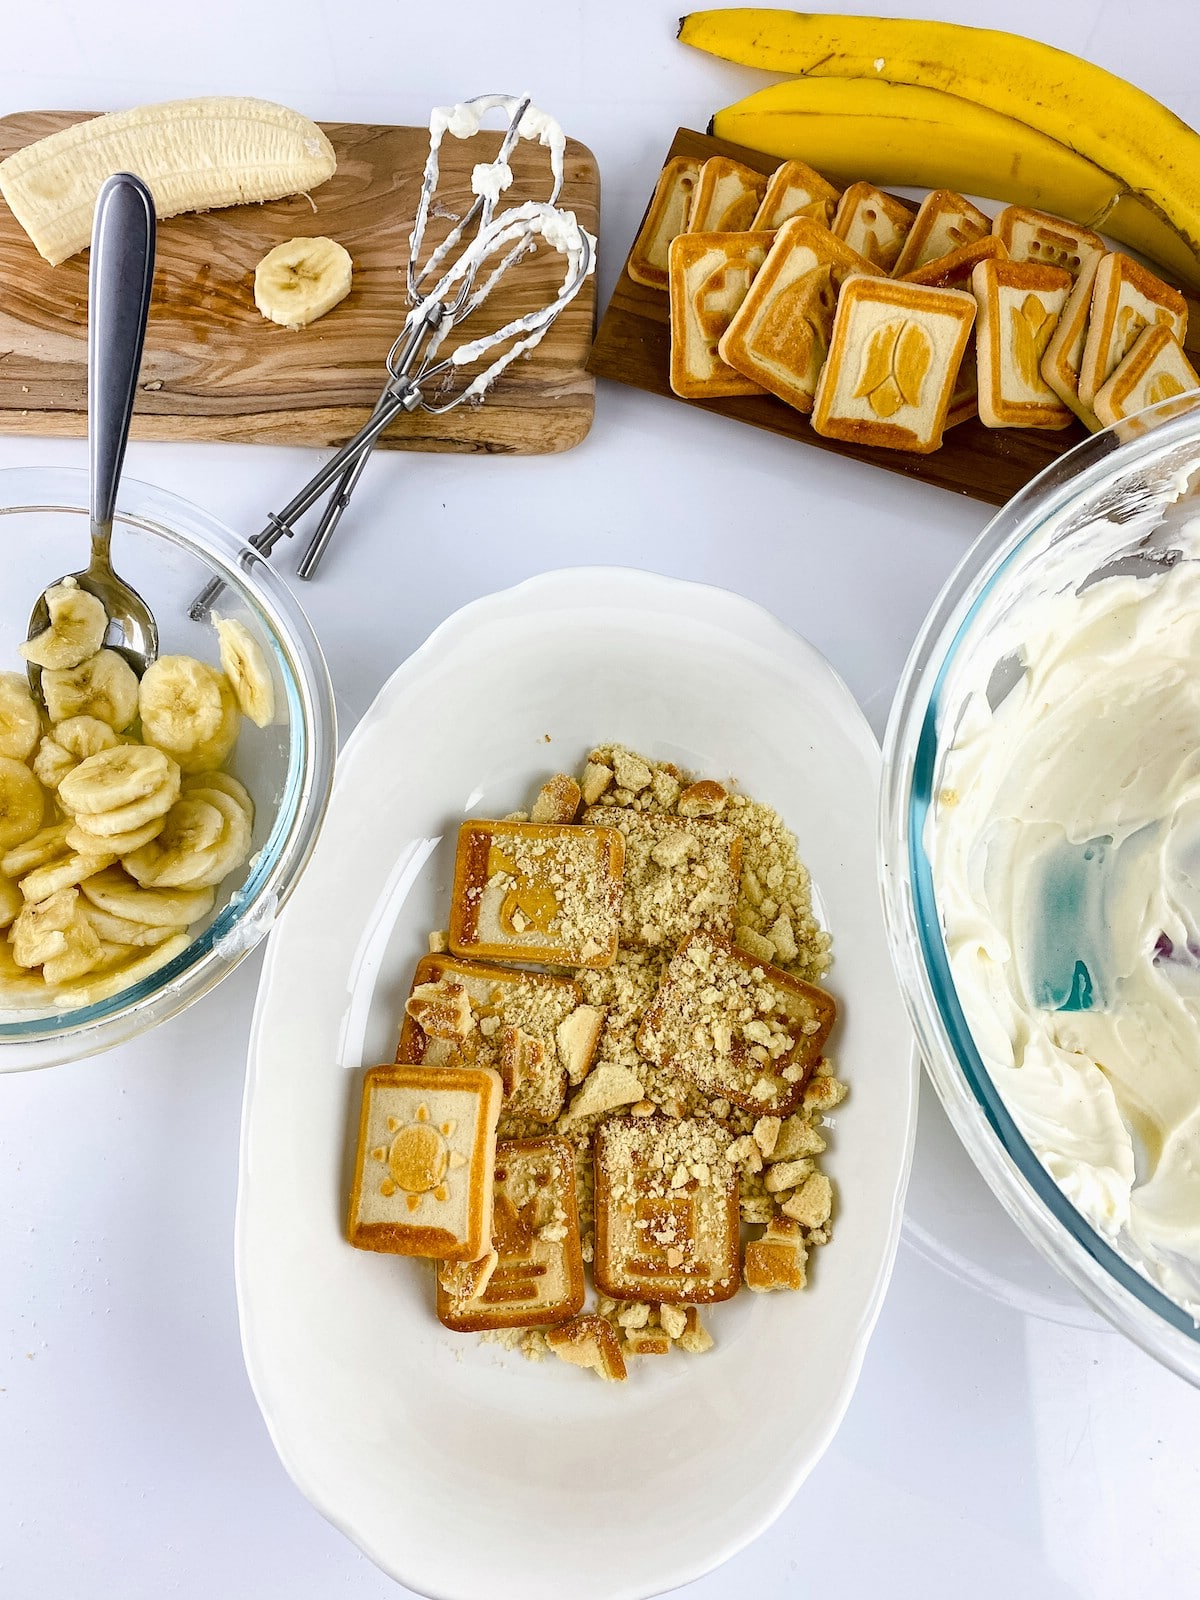 Assembling banana pudding layers in white bowl